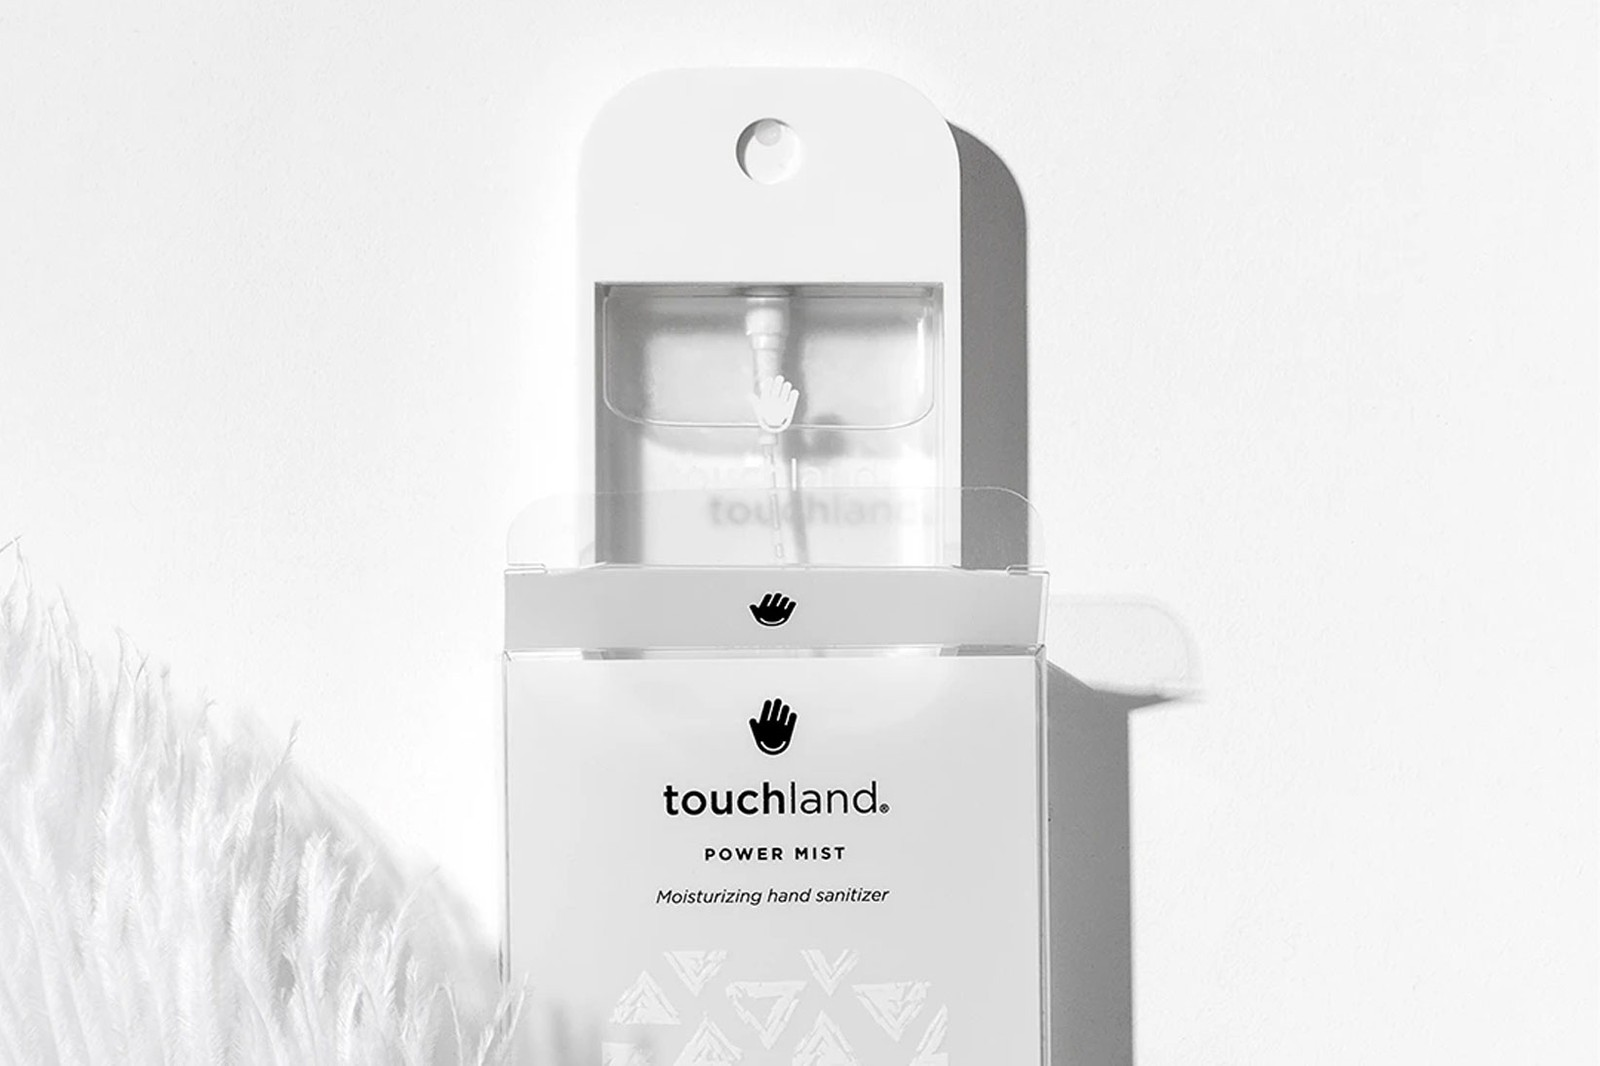 best moisturizing hand sanitizers spray gel covid-19 coronavirus pandemic hygiene care touchland aesop everyday humans